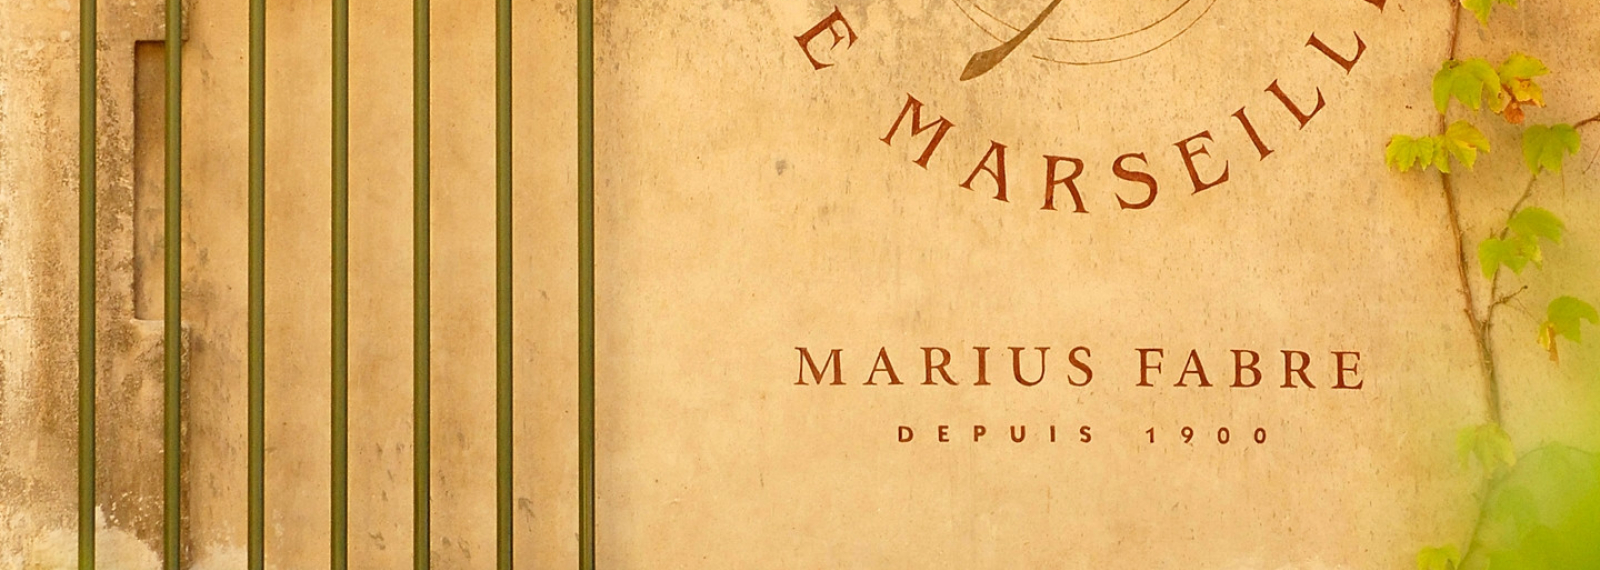 Musée du savon de Marseille. Marius Fabre